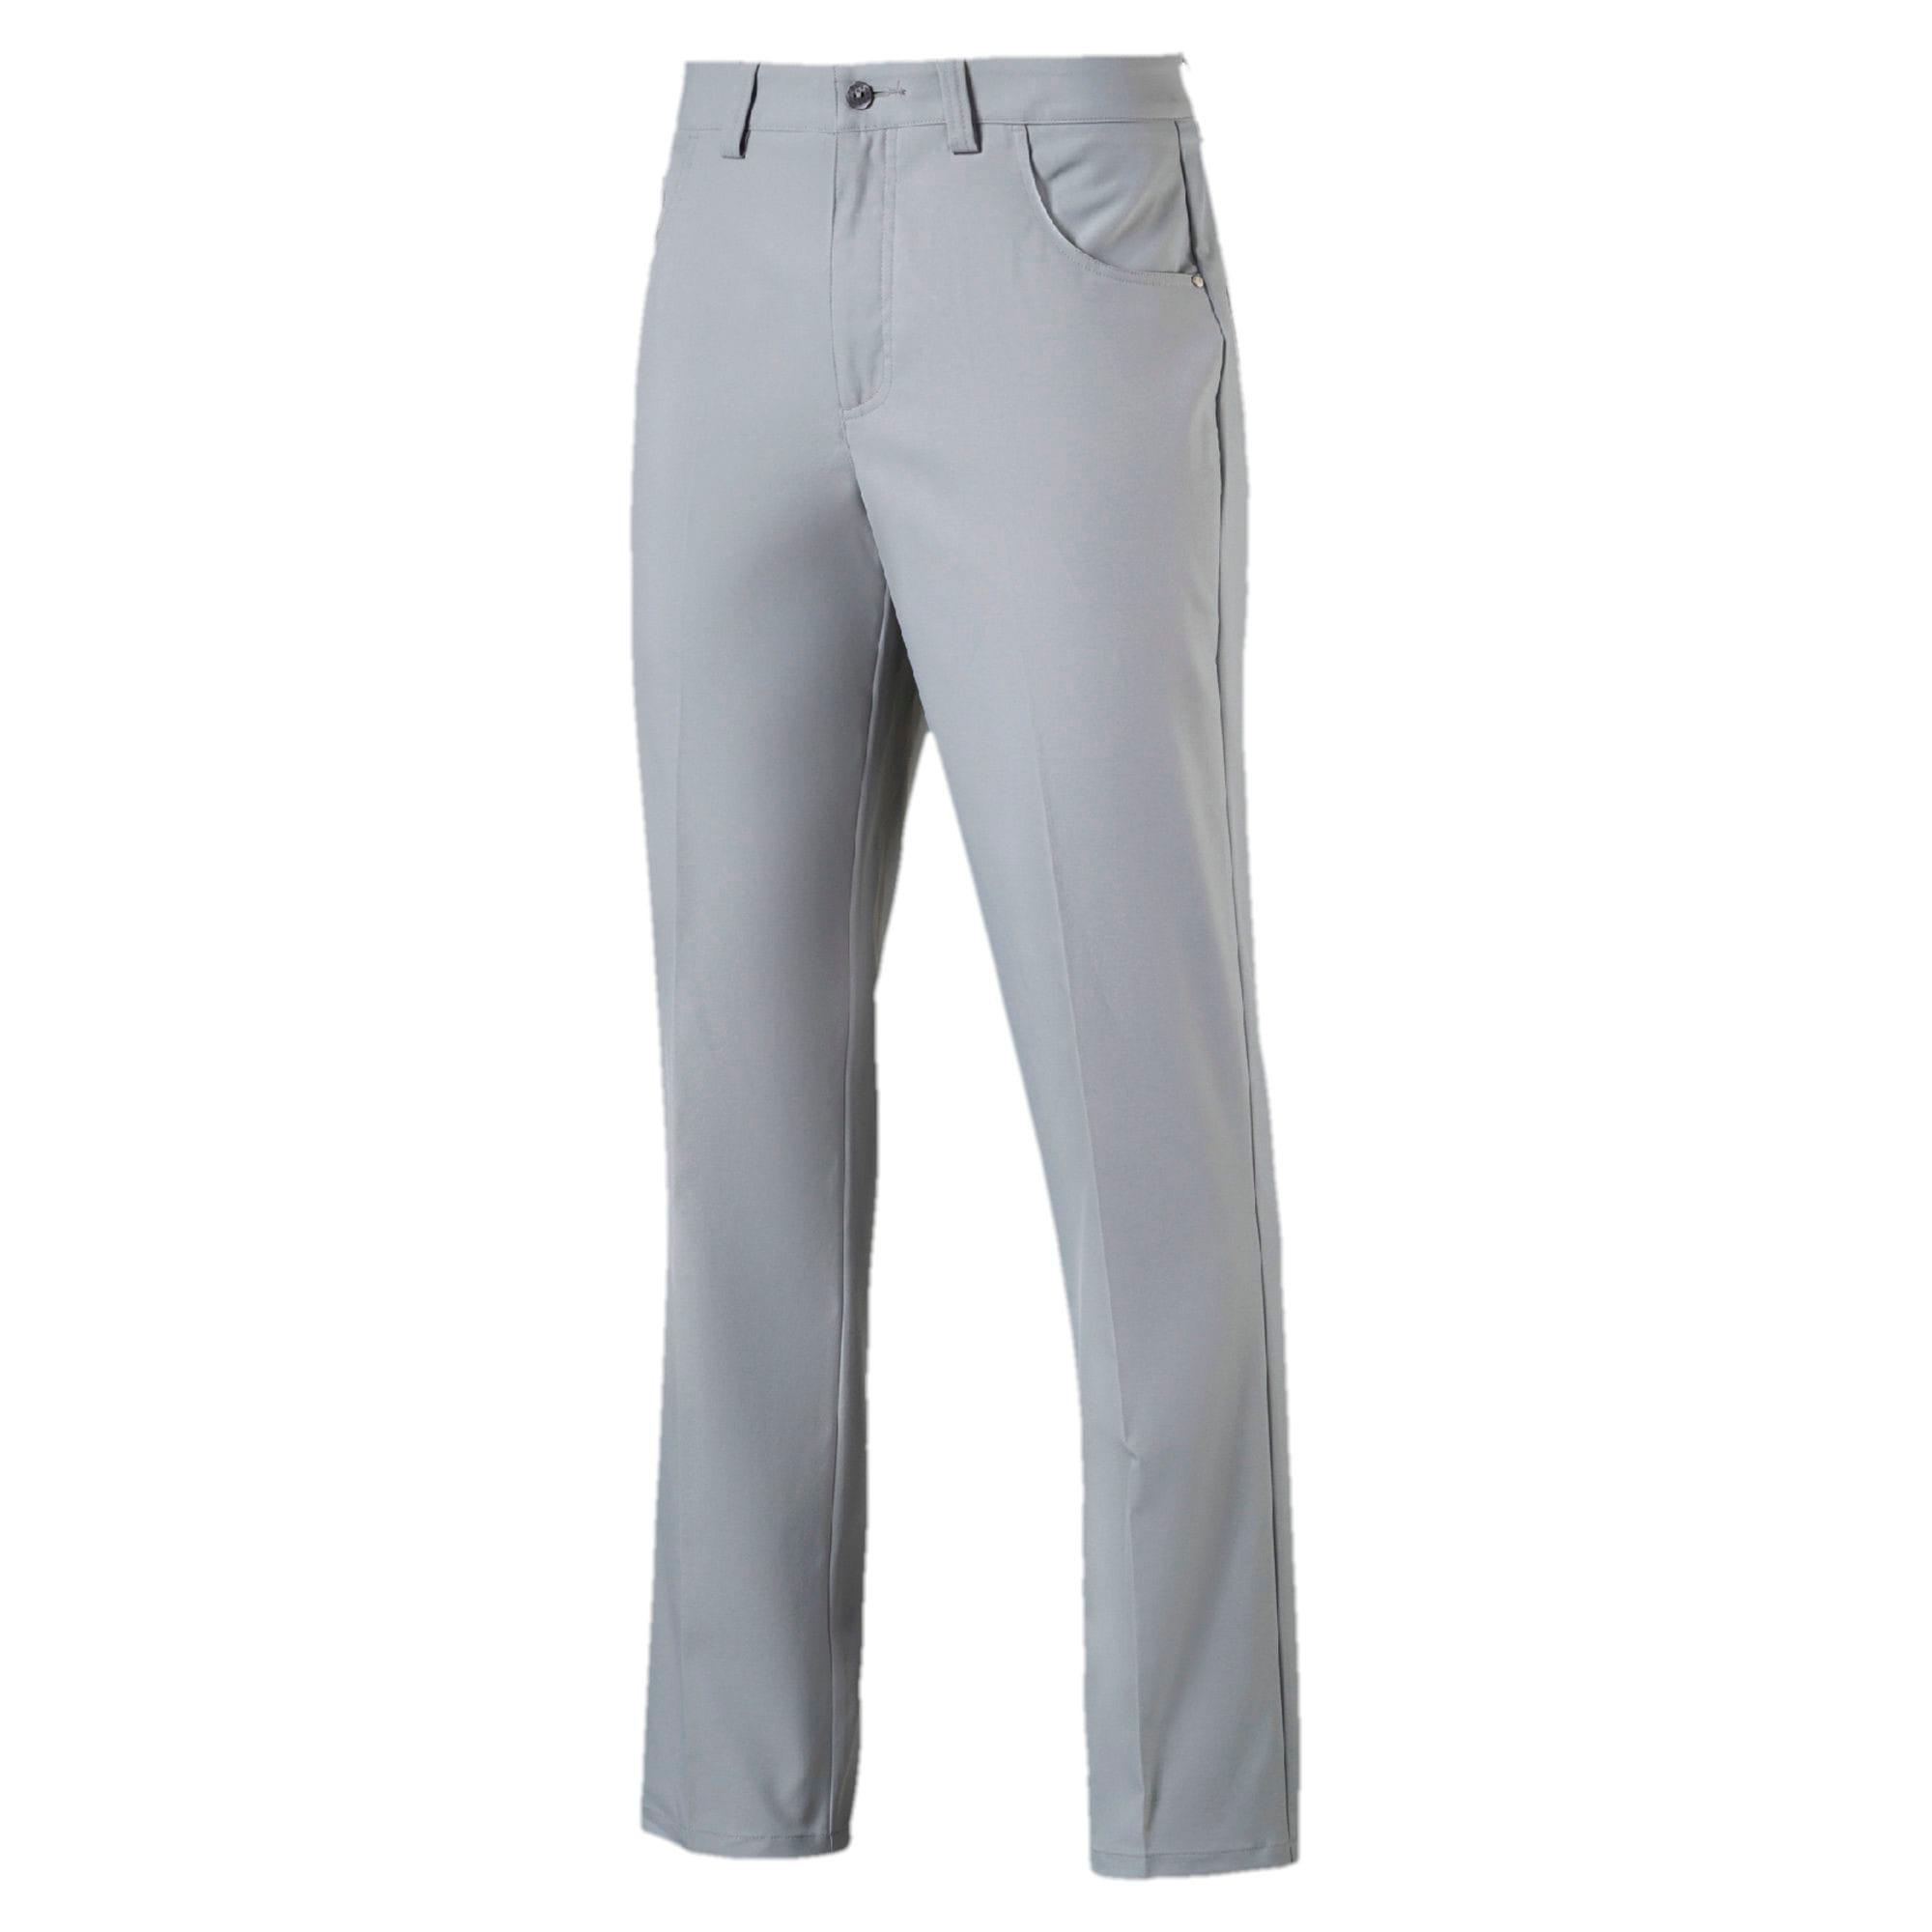 Thumbnail 1 of Men's 6 Pocket Pants, Quarry, medium